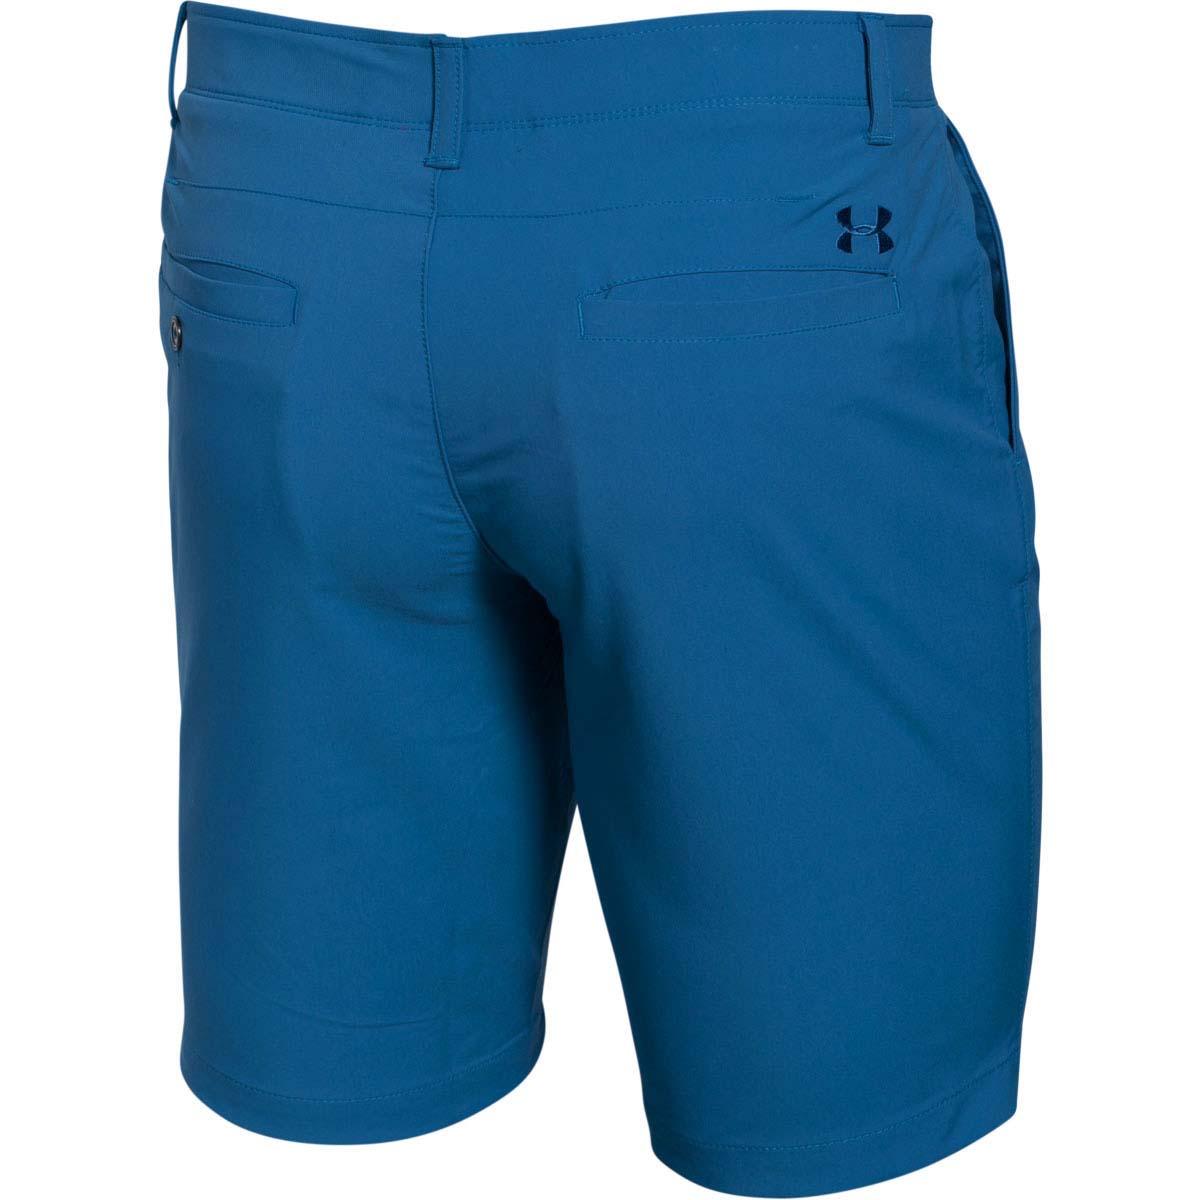 Under-Armour-Homme-UA-Match-Play-conique-Tech-Performance-Golf-Shorts-29-off-RRP miniature 15